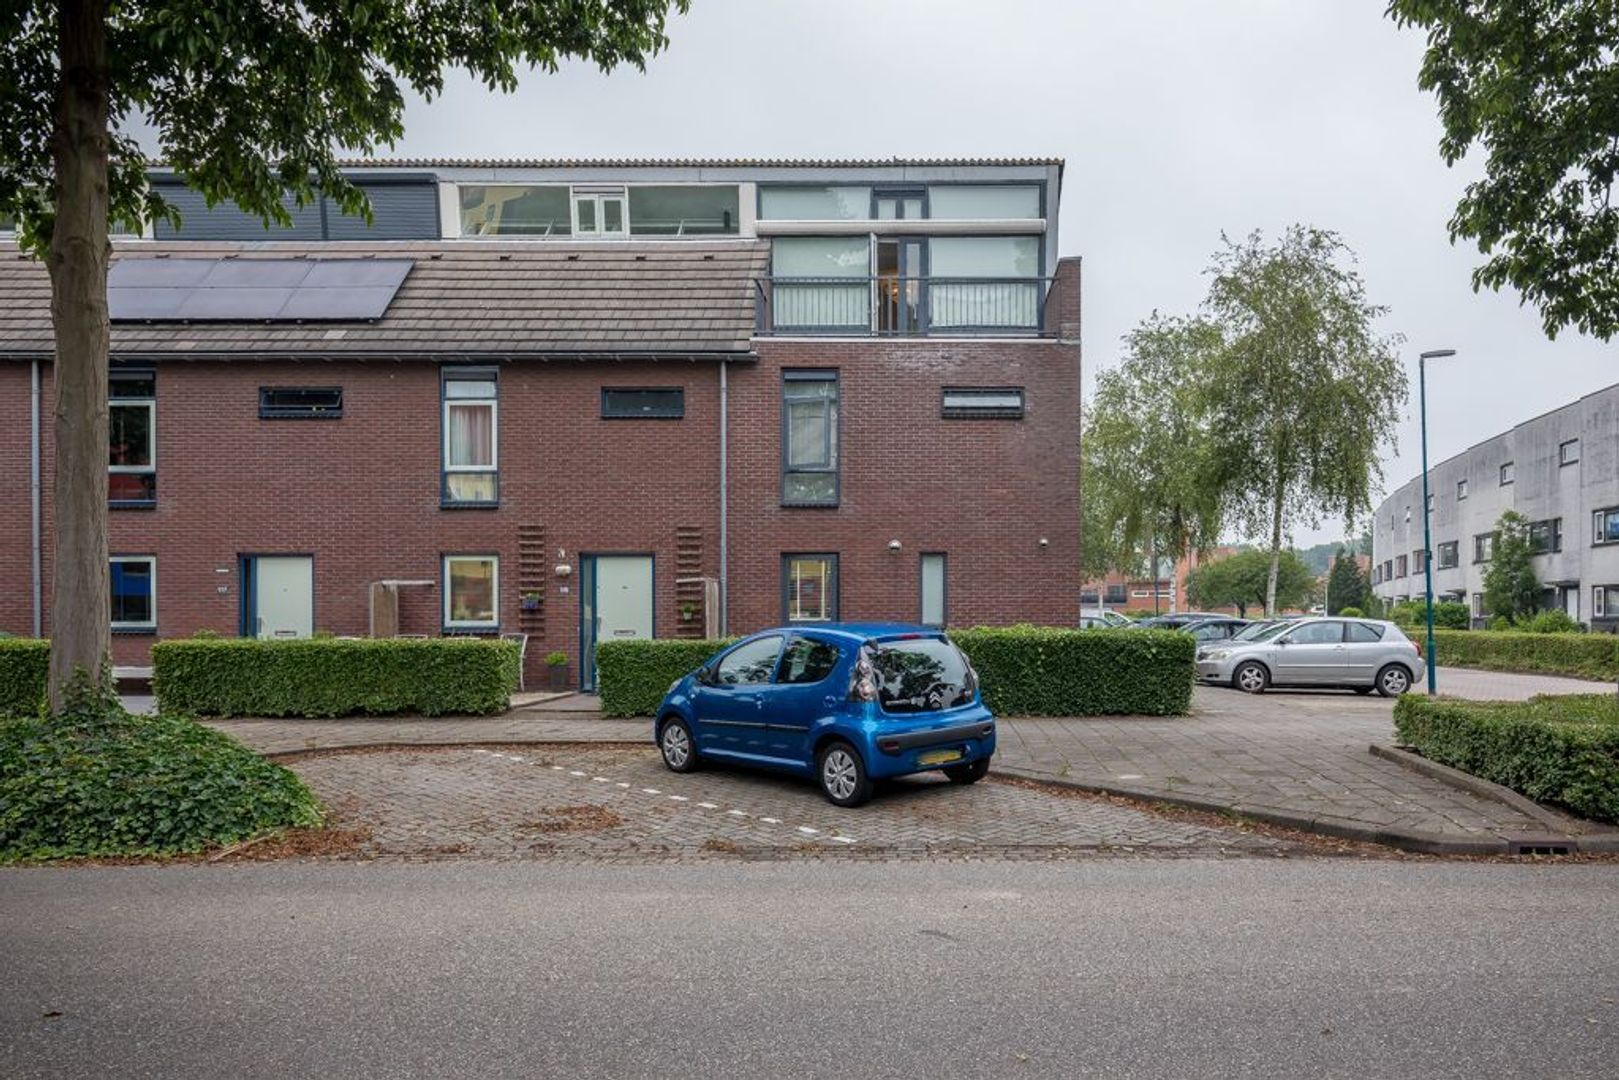 Balsahout 35, Zoetermeer foto-1